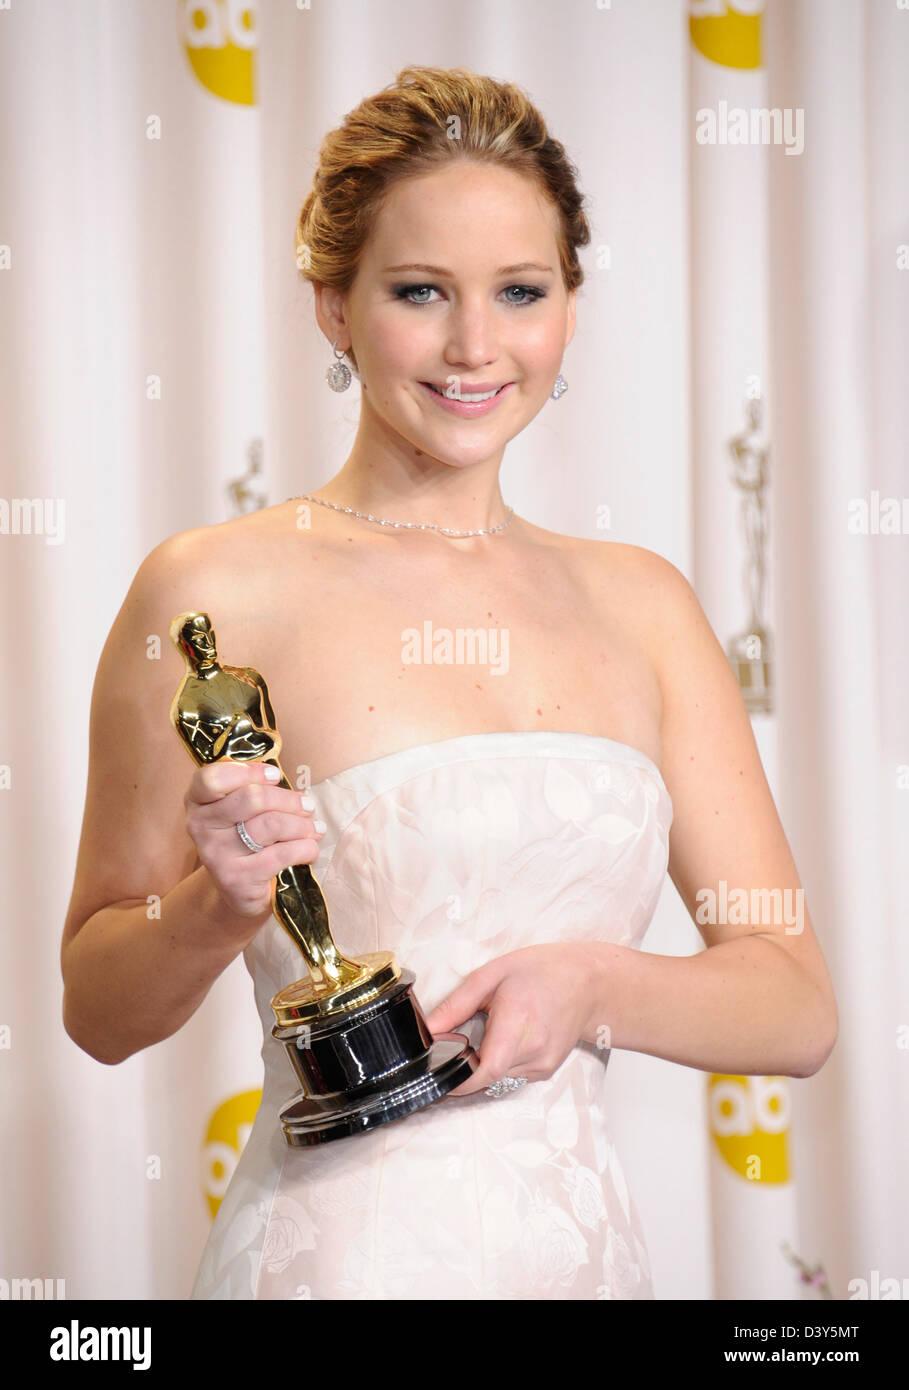 Jennifer Lawrence 2013 Stock Photos Amp Jennifer Lawrence